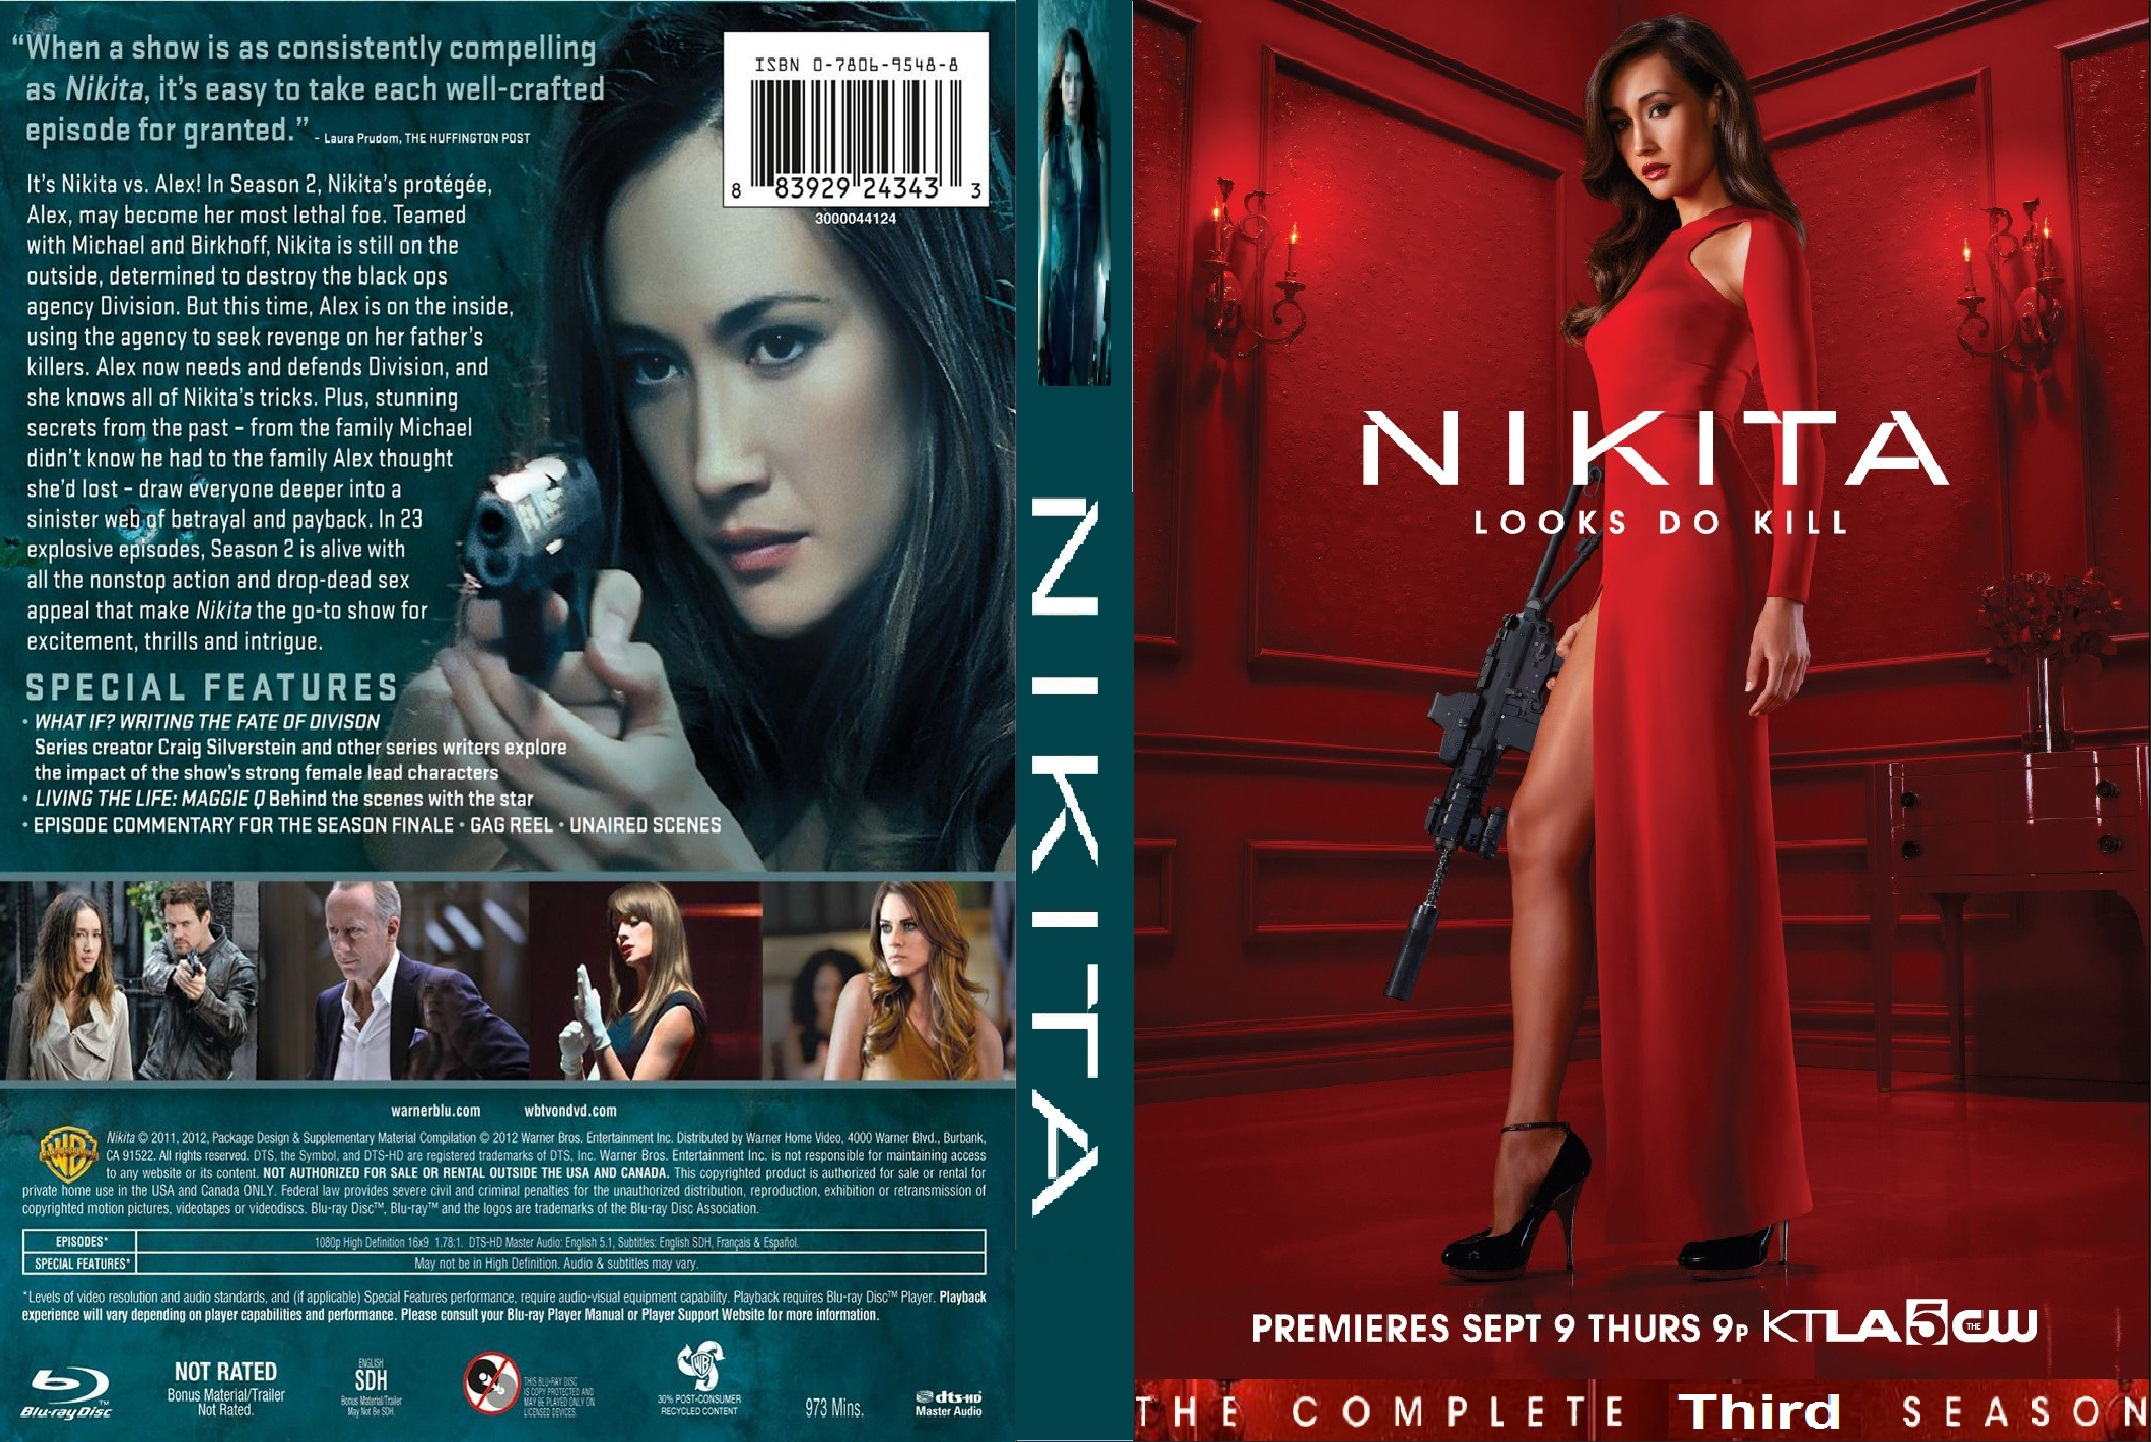 Nikita season 2 episode guide list